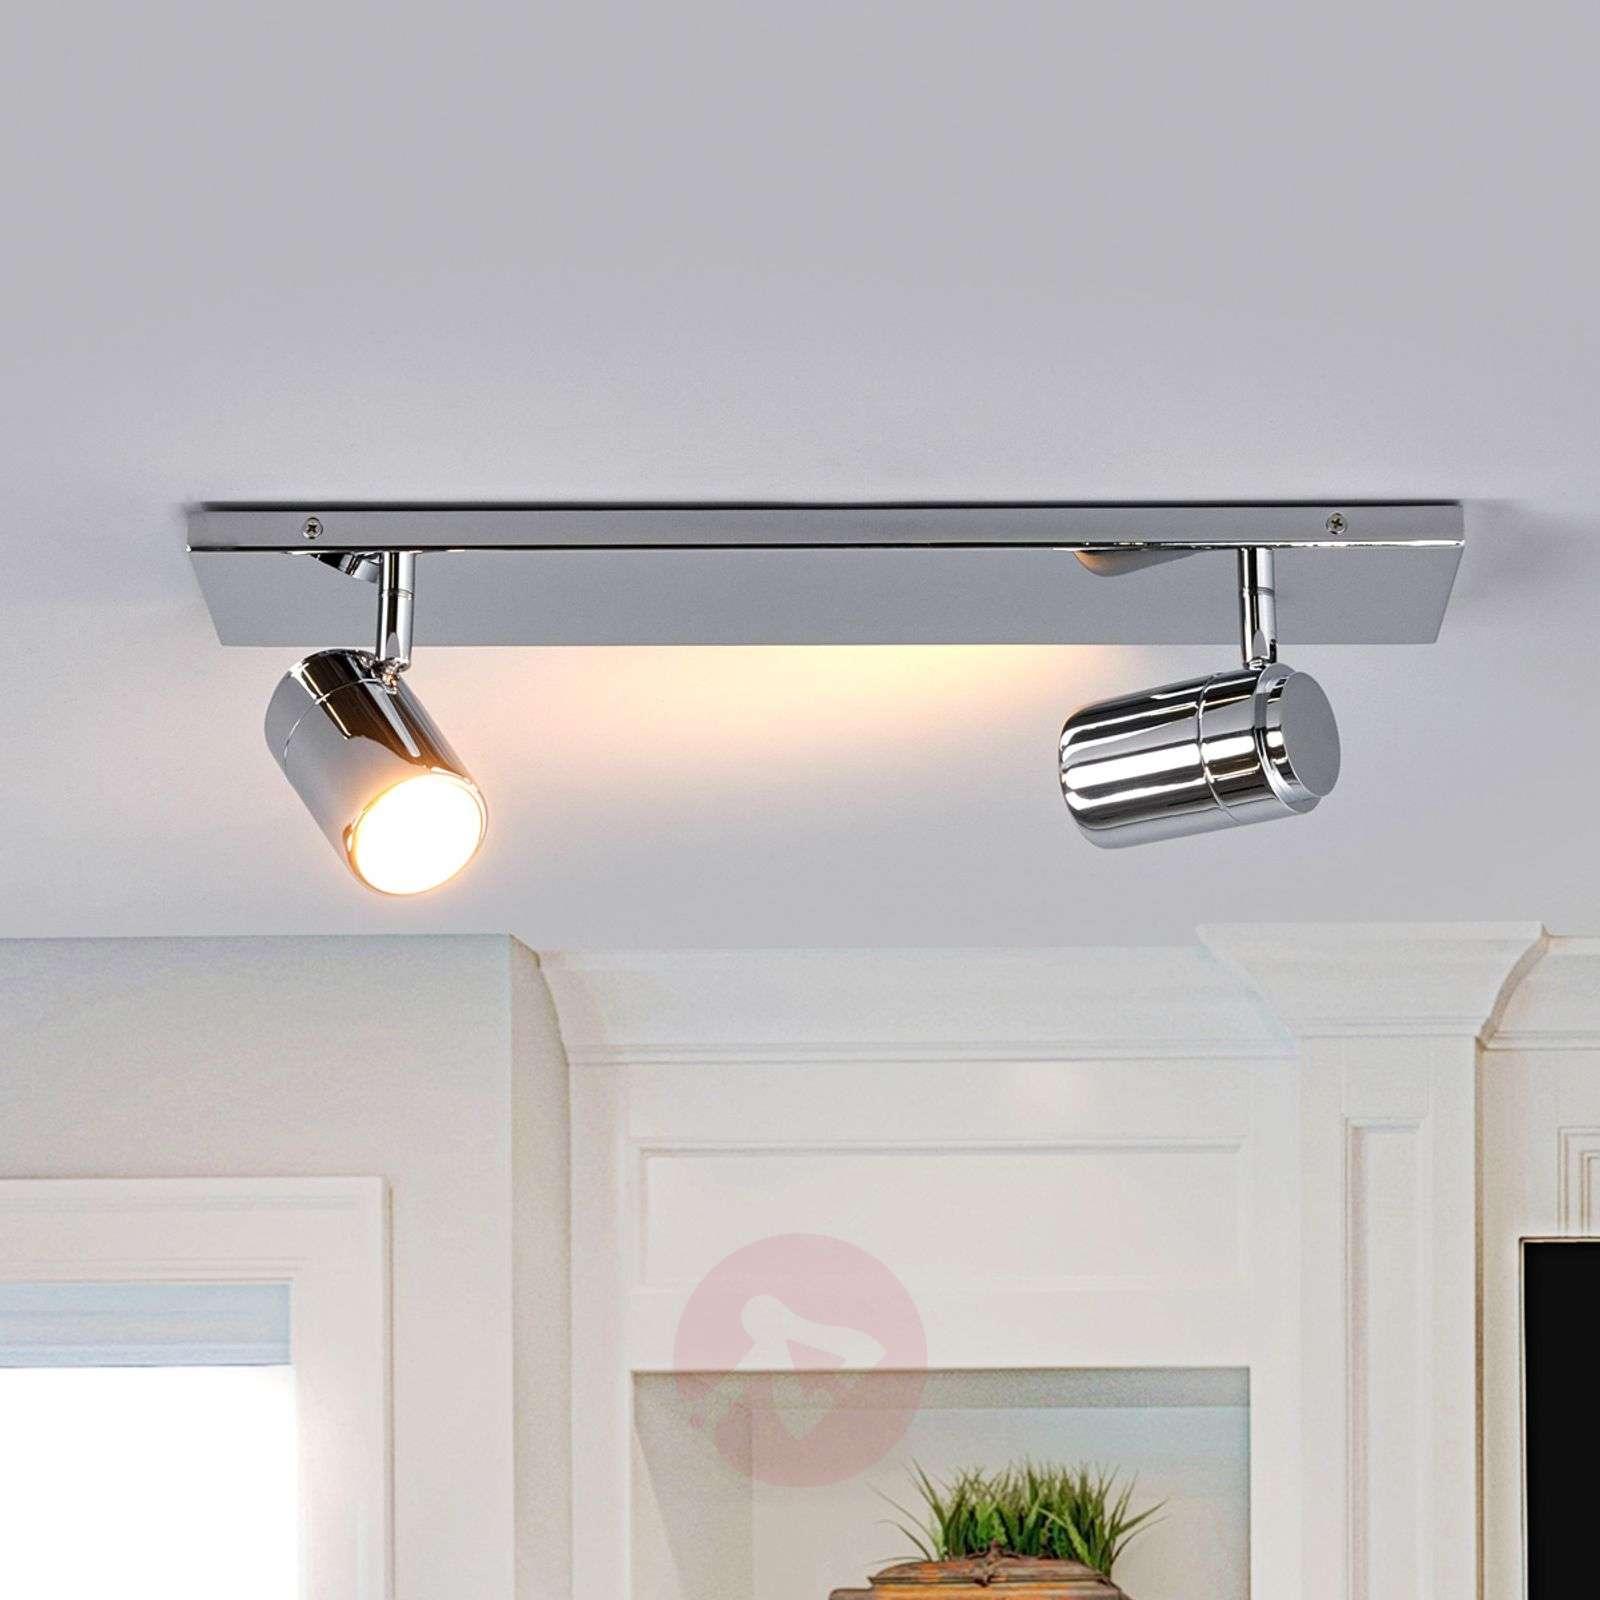 Dejan bathroom wall light in chrome, two bulbs-9641037-01